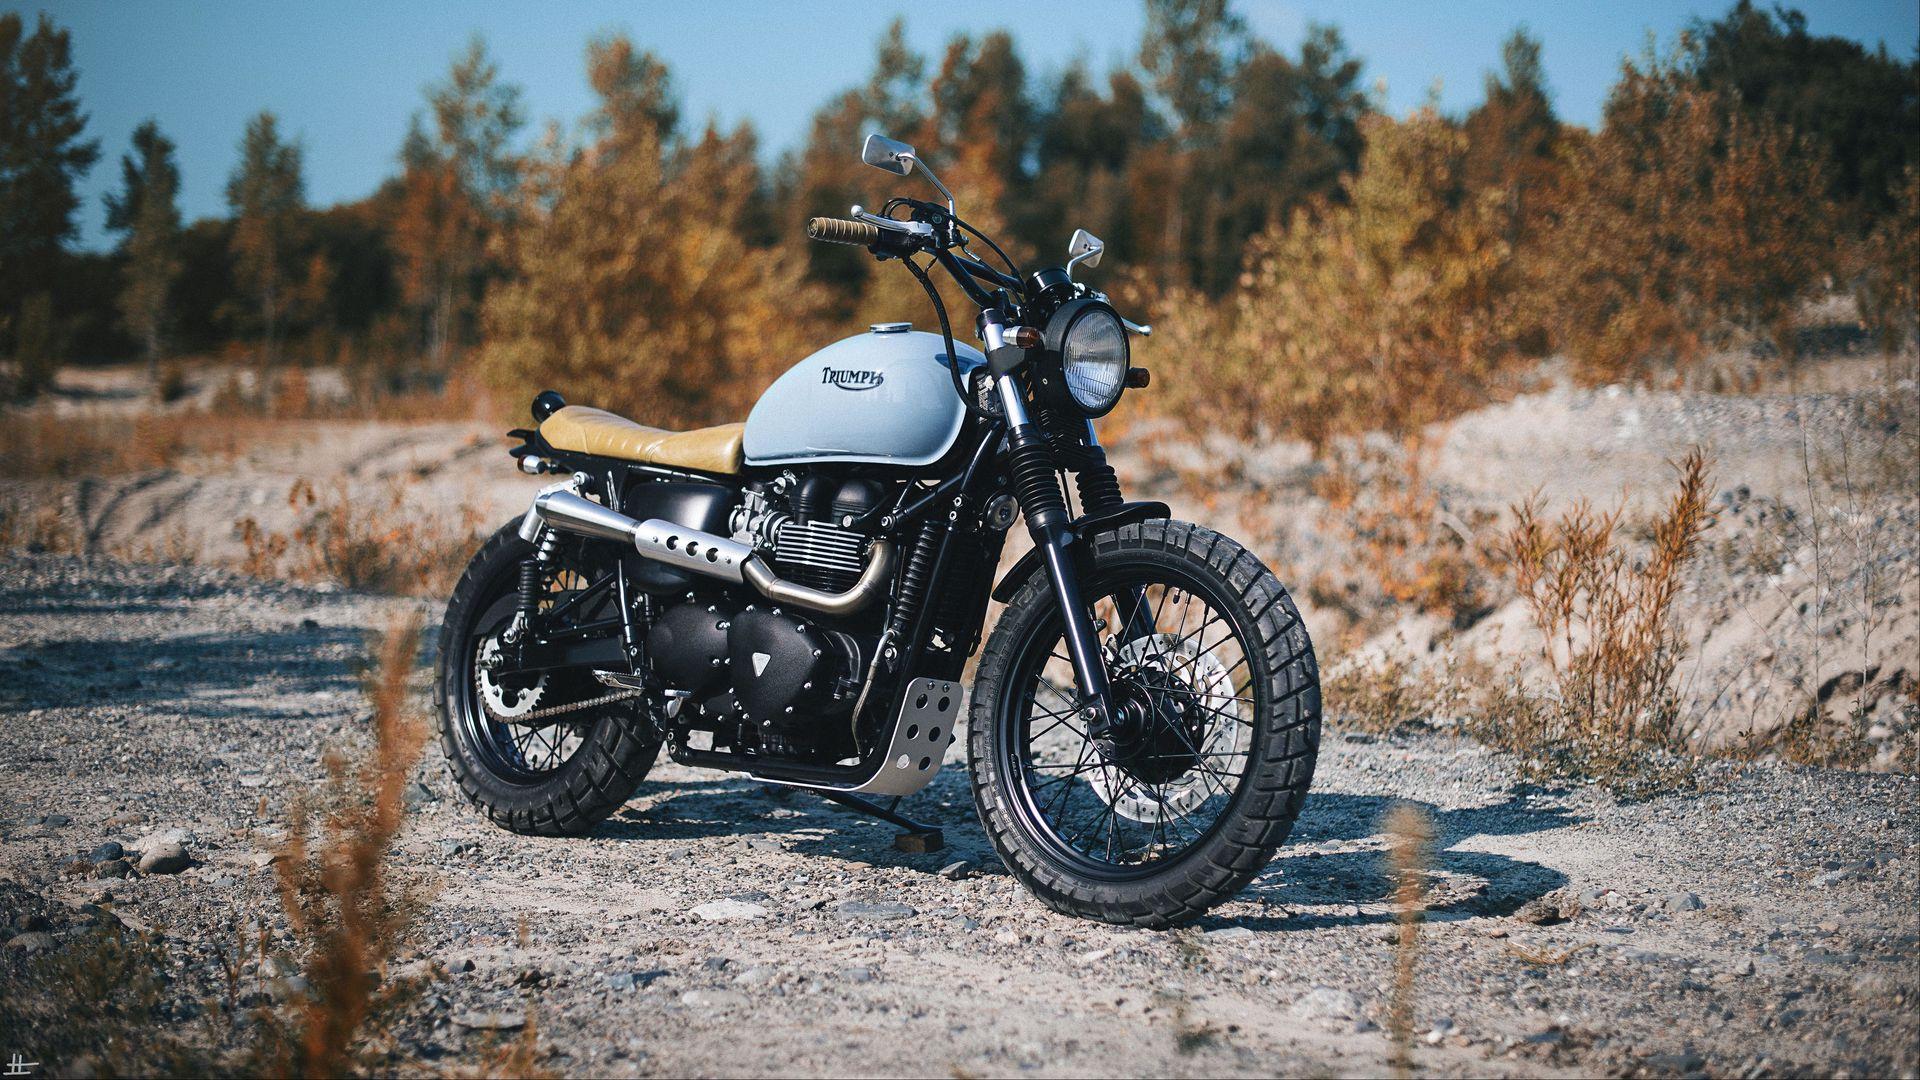 1920x1080 Обои triumph, bonneville, мотоцикл, вид сбоку